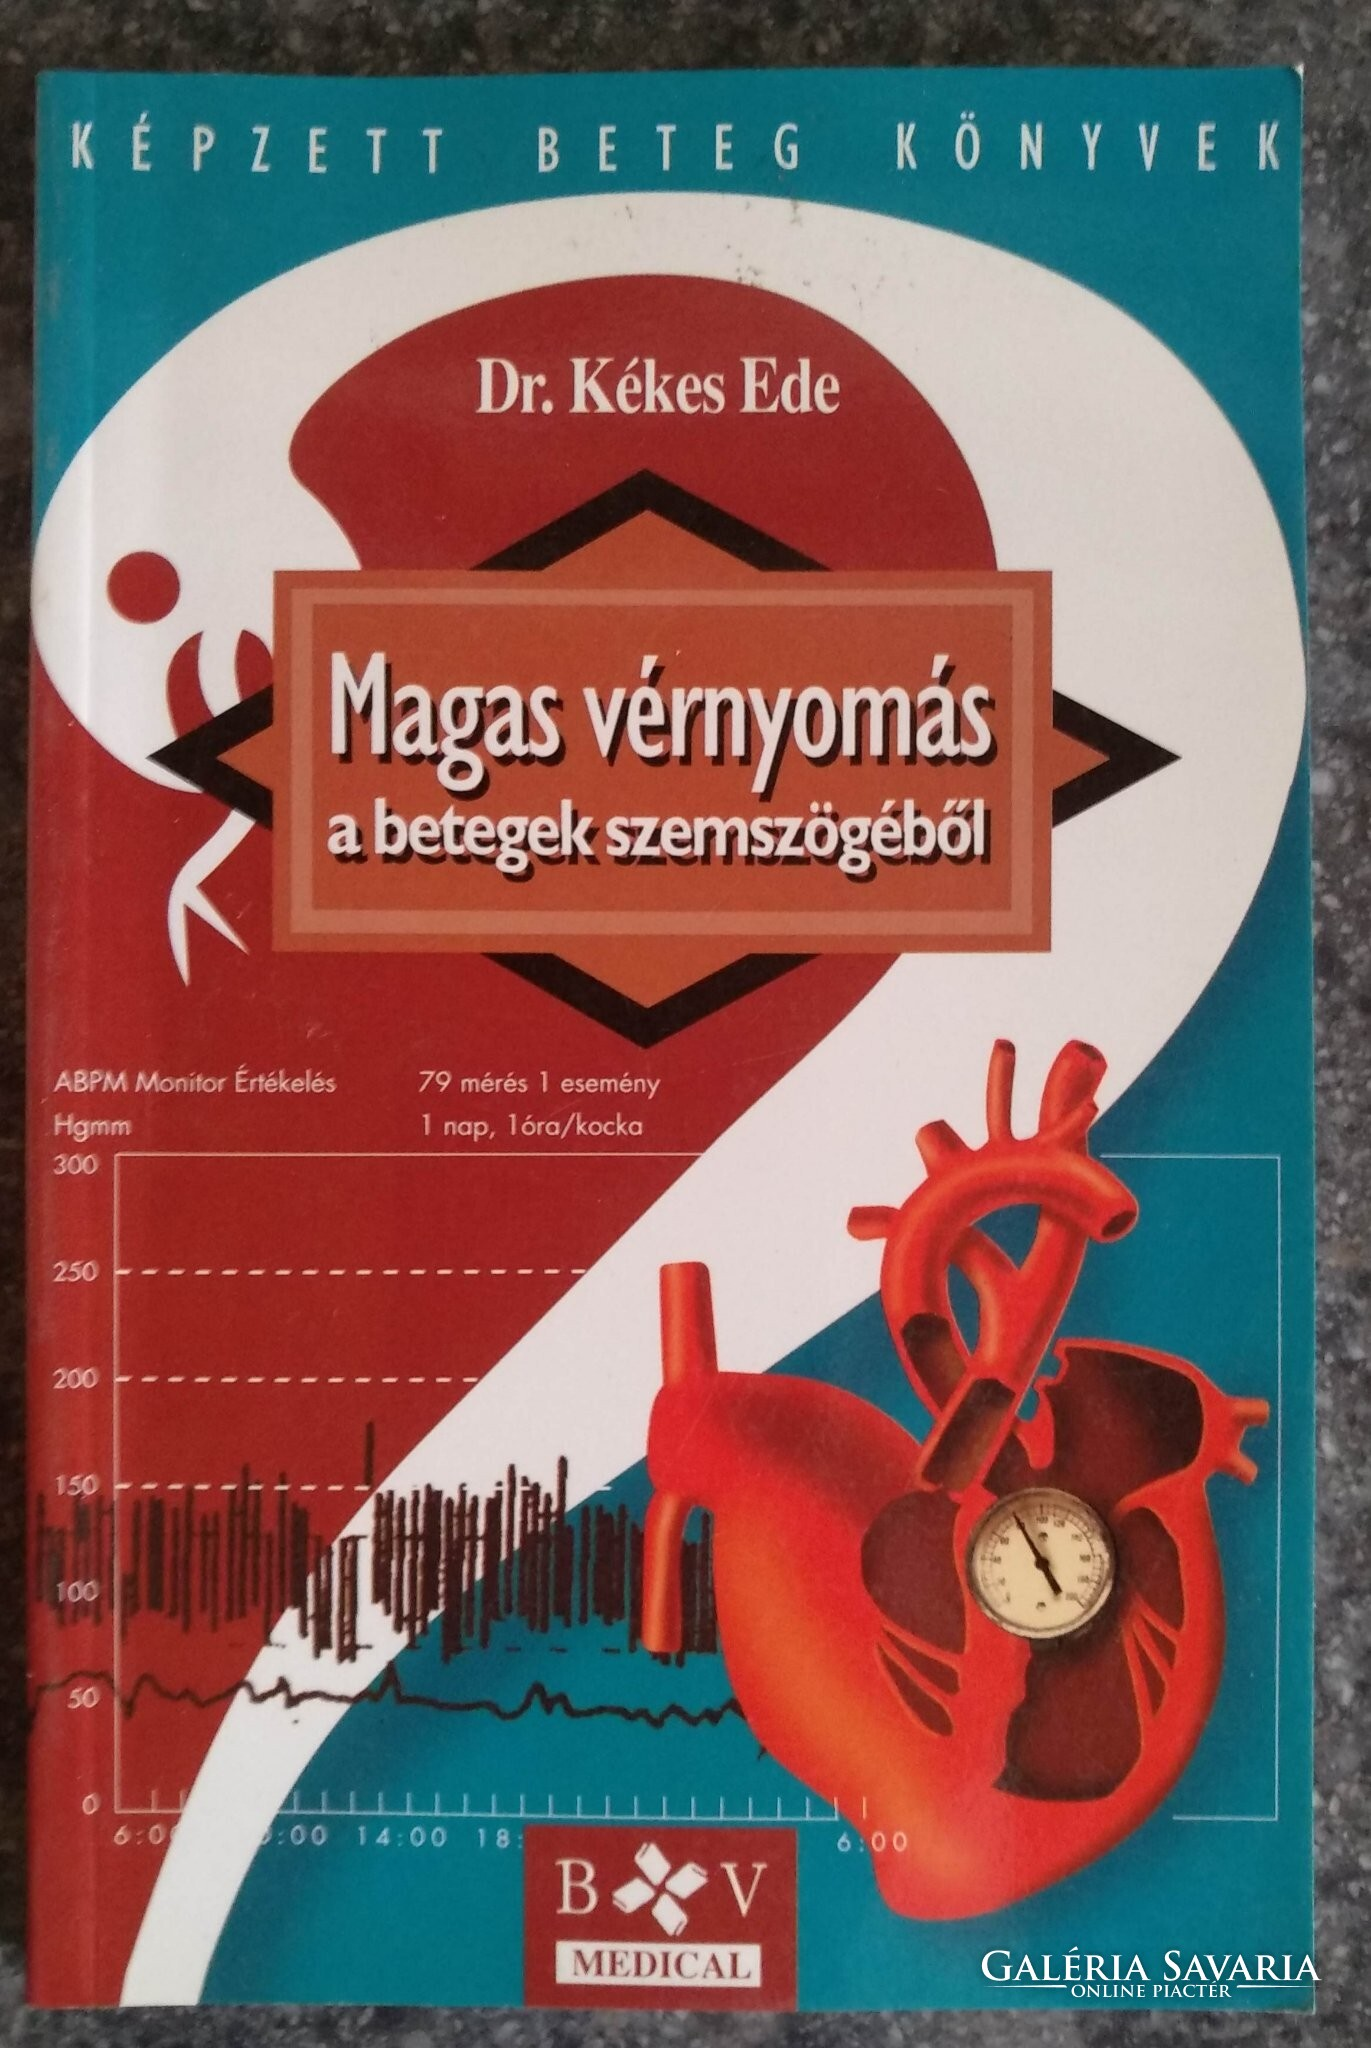 magas vérnyomás jelentése románul